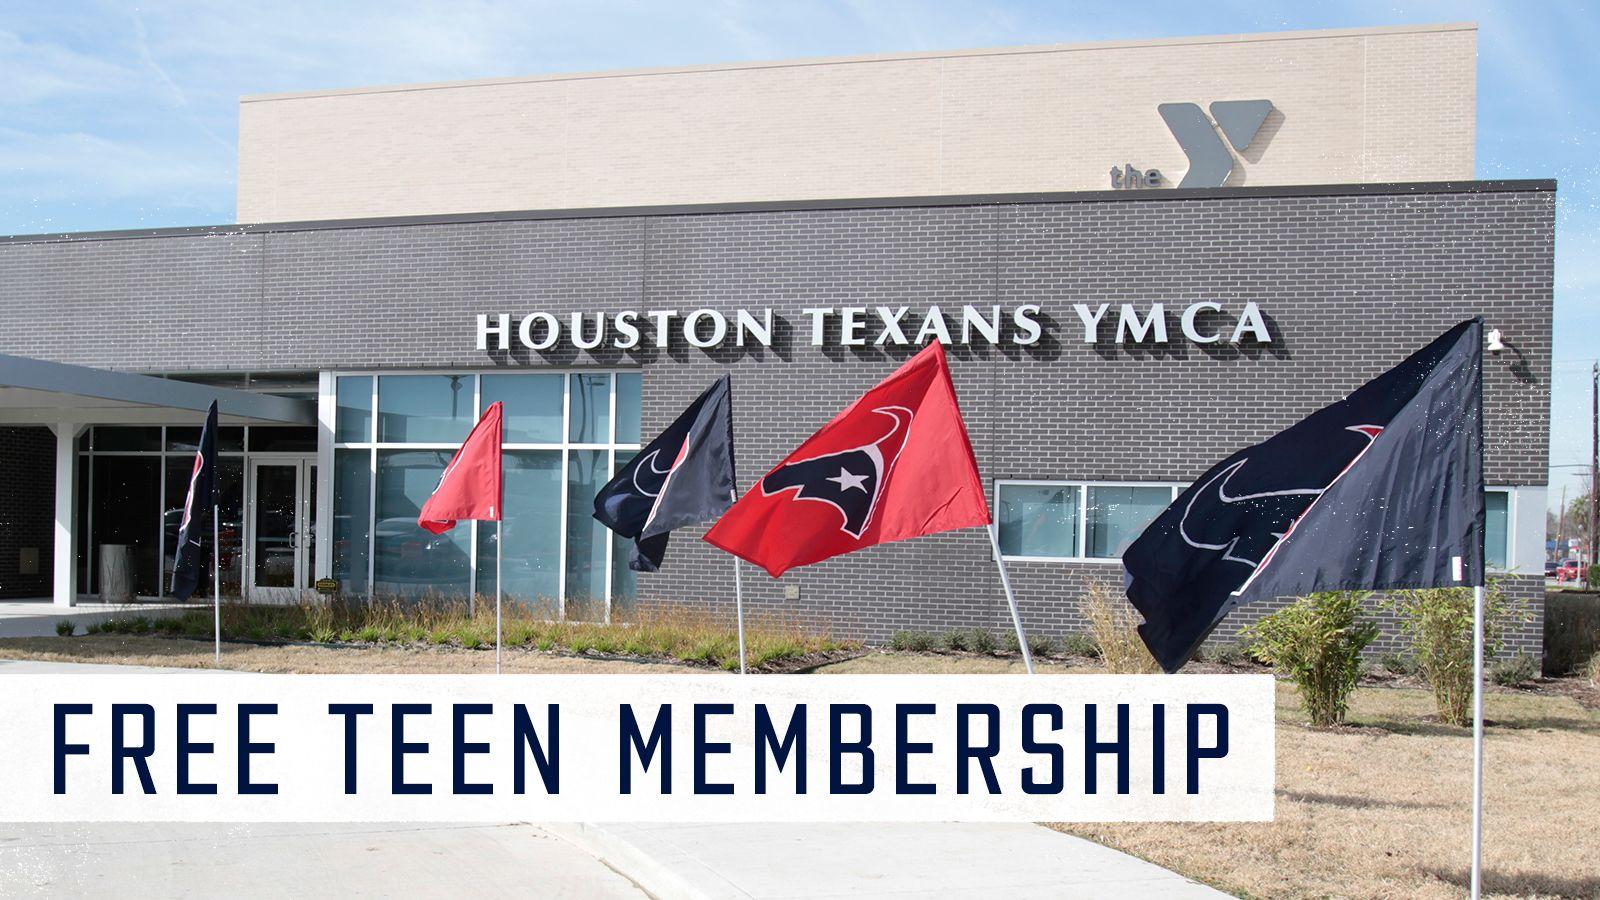 Free Teen Membership